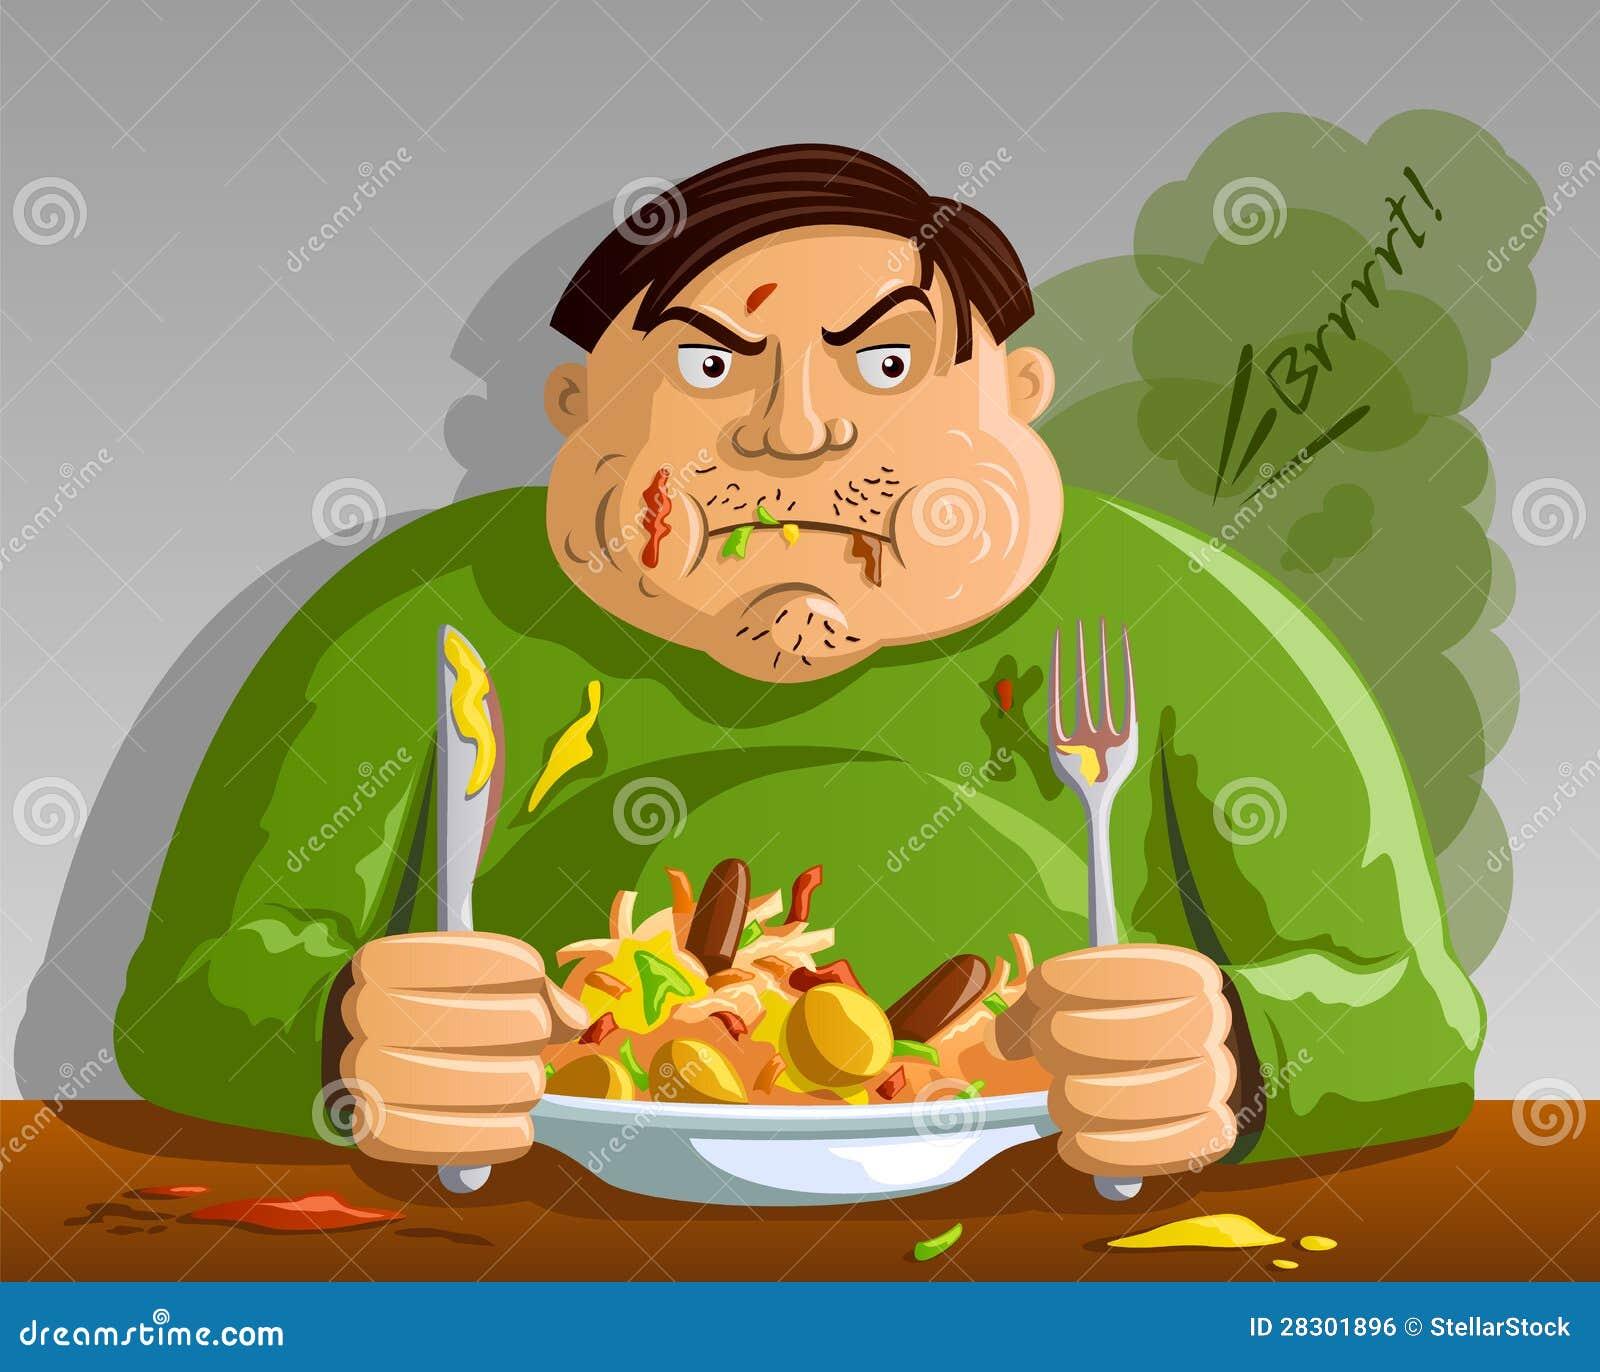 gourmandise-gloutonnerie-homme-mangeant-avec-exc%C3%A8s-28301896.jpg